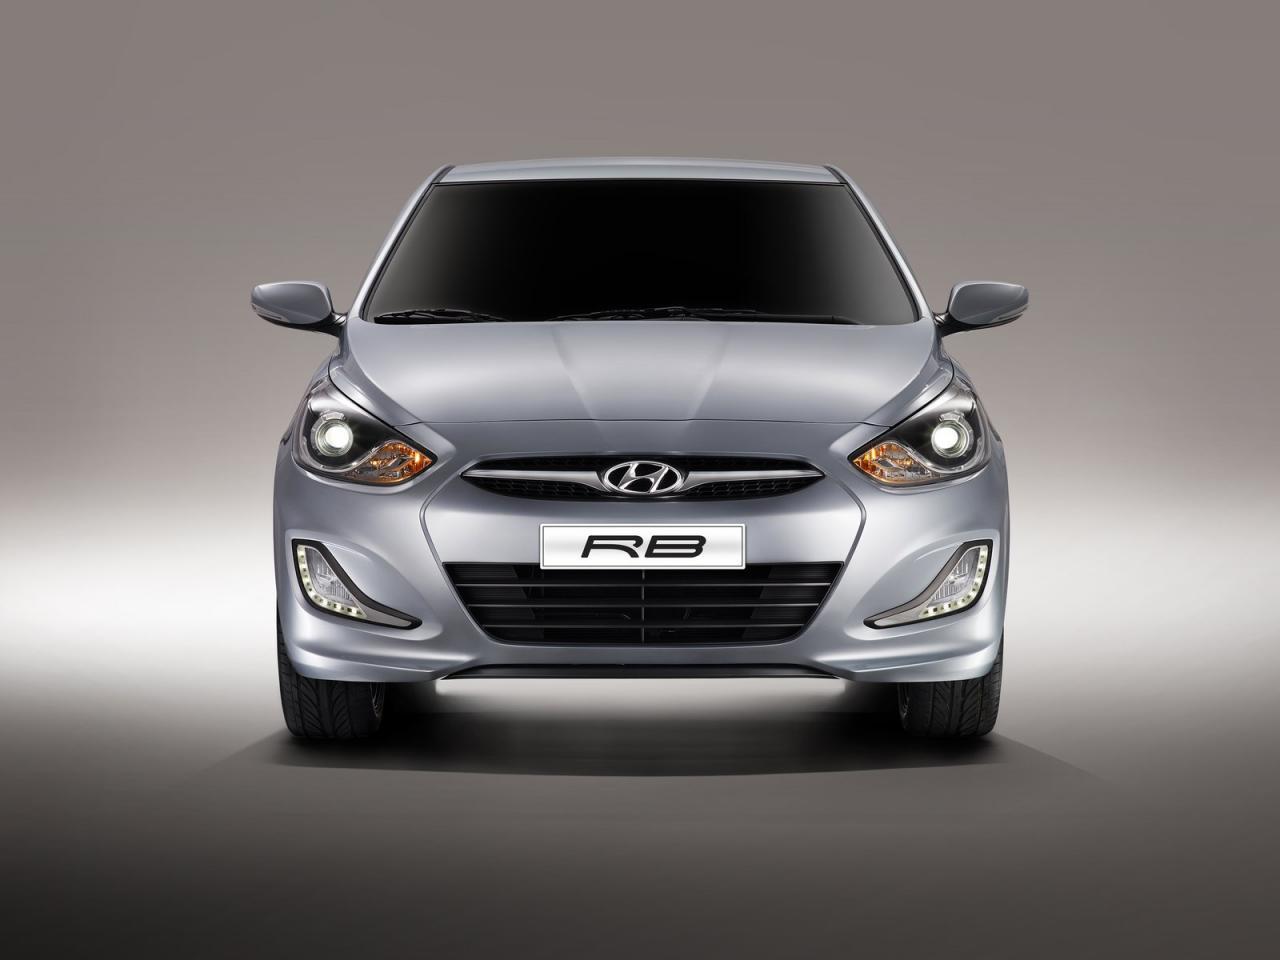 Vwvortexcom New Hyundai Accent Rs Concept Potentially Us Version 2001 Trajet Wiring Diagram Thread